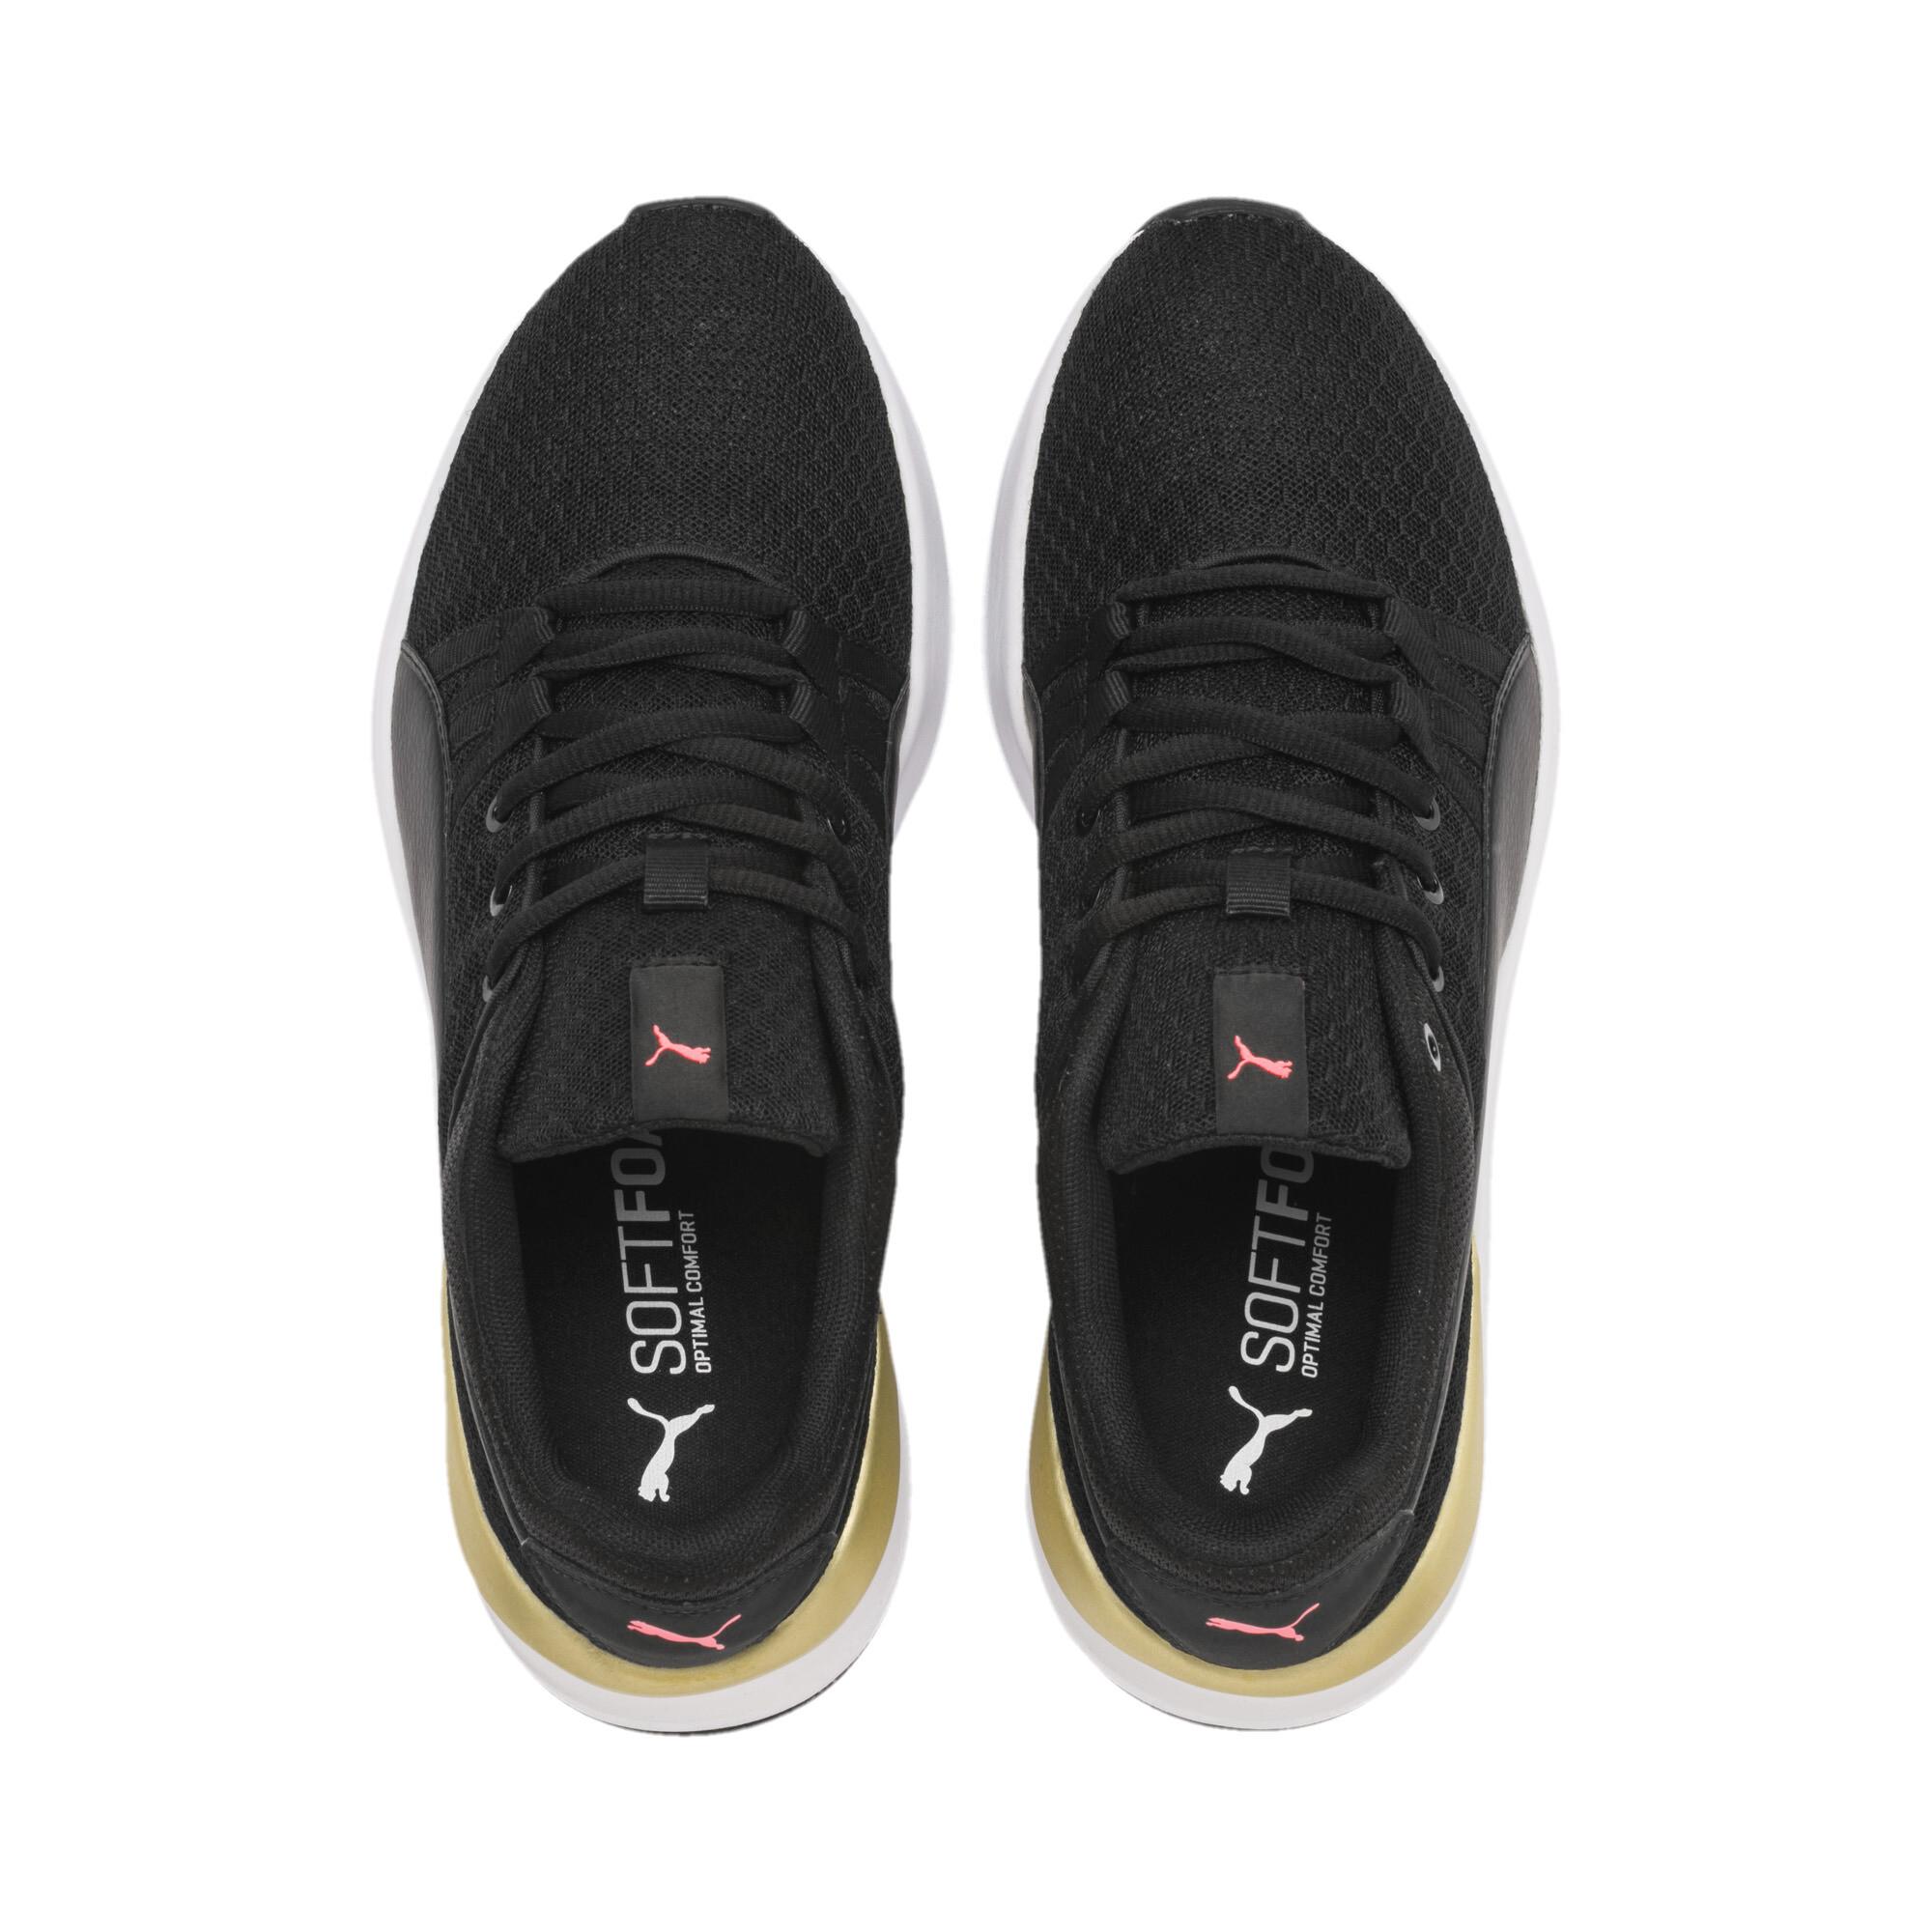 PUMA-Adela-Core-Women-s-Sneakers-Women-Shoe-Basics thumbnail 8